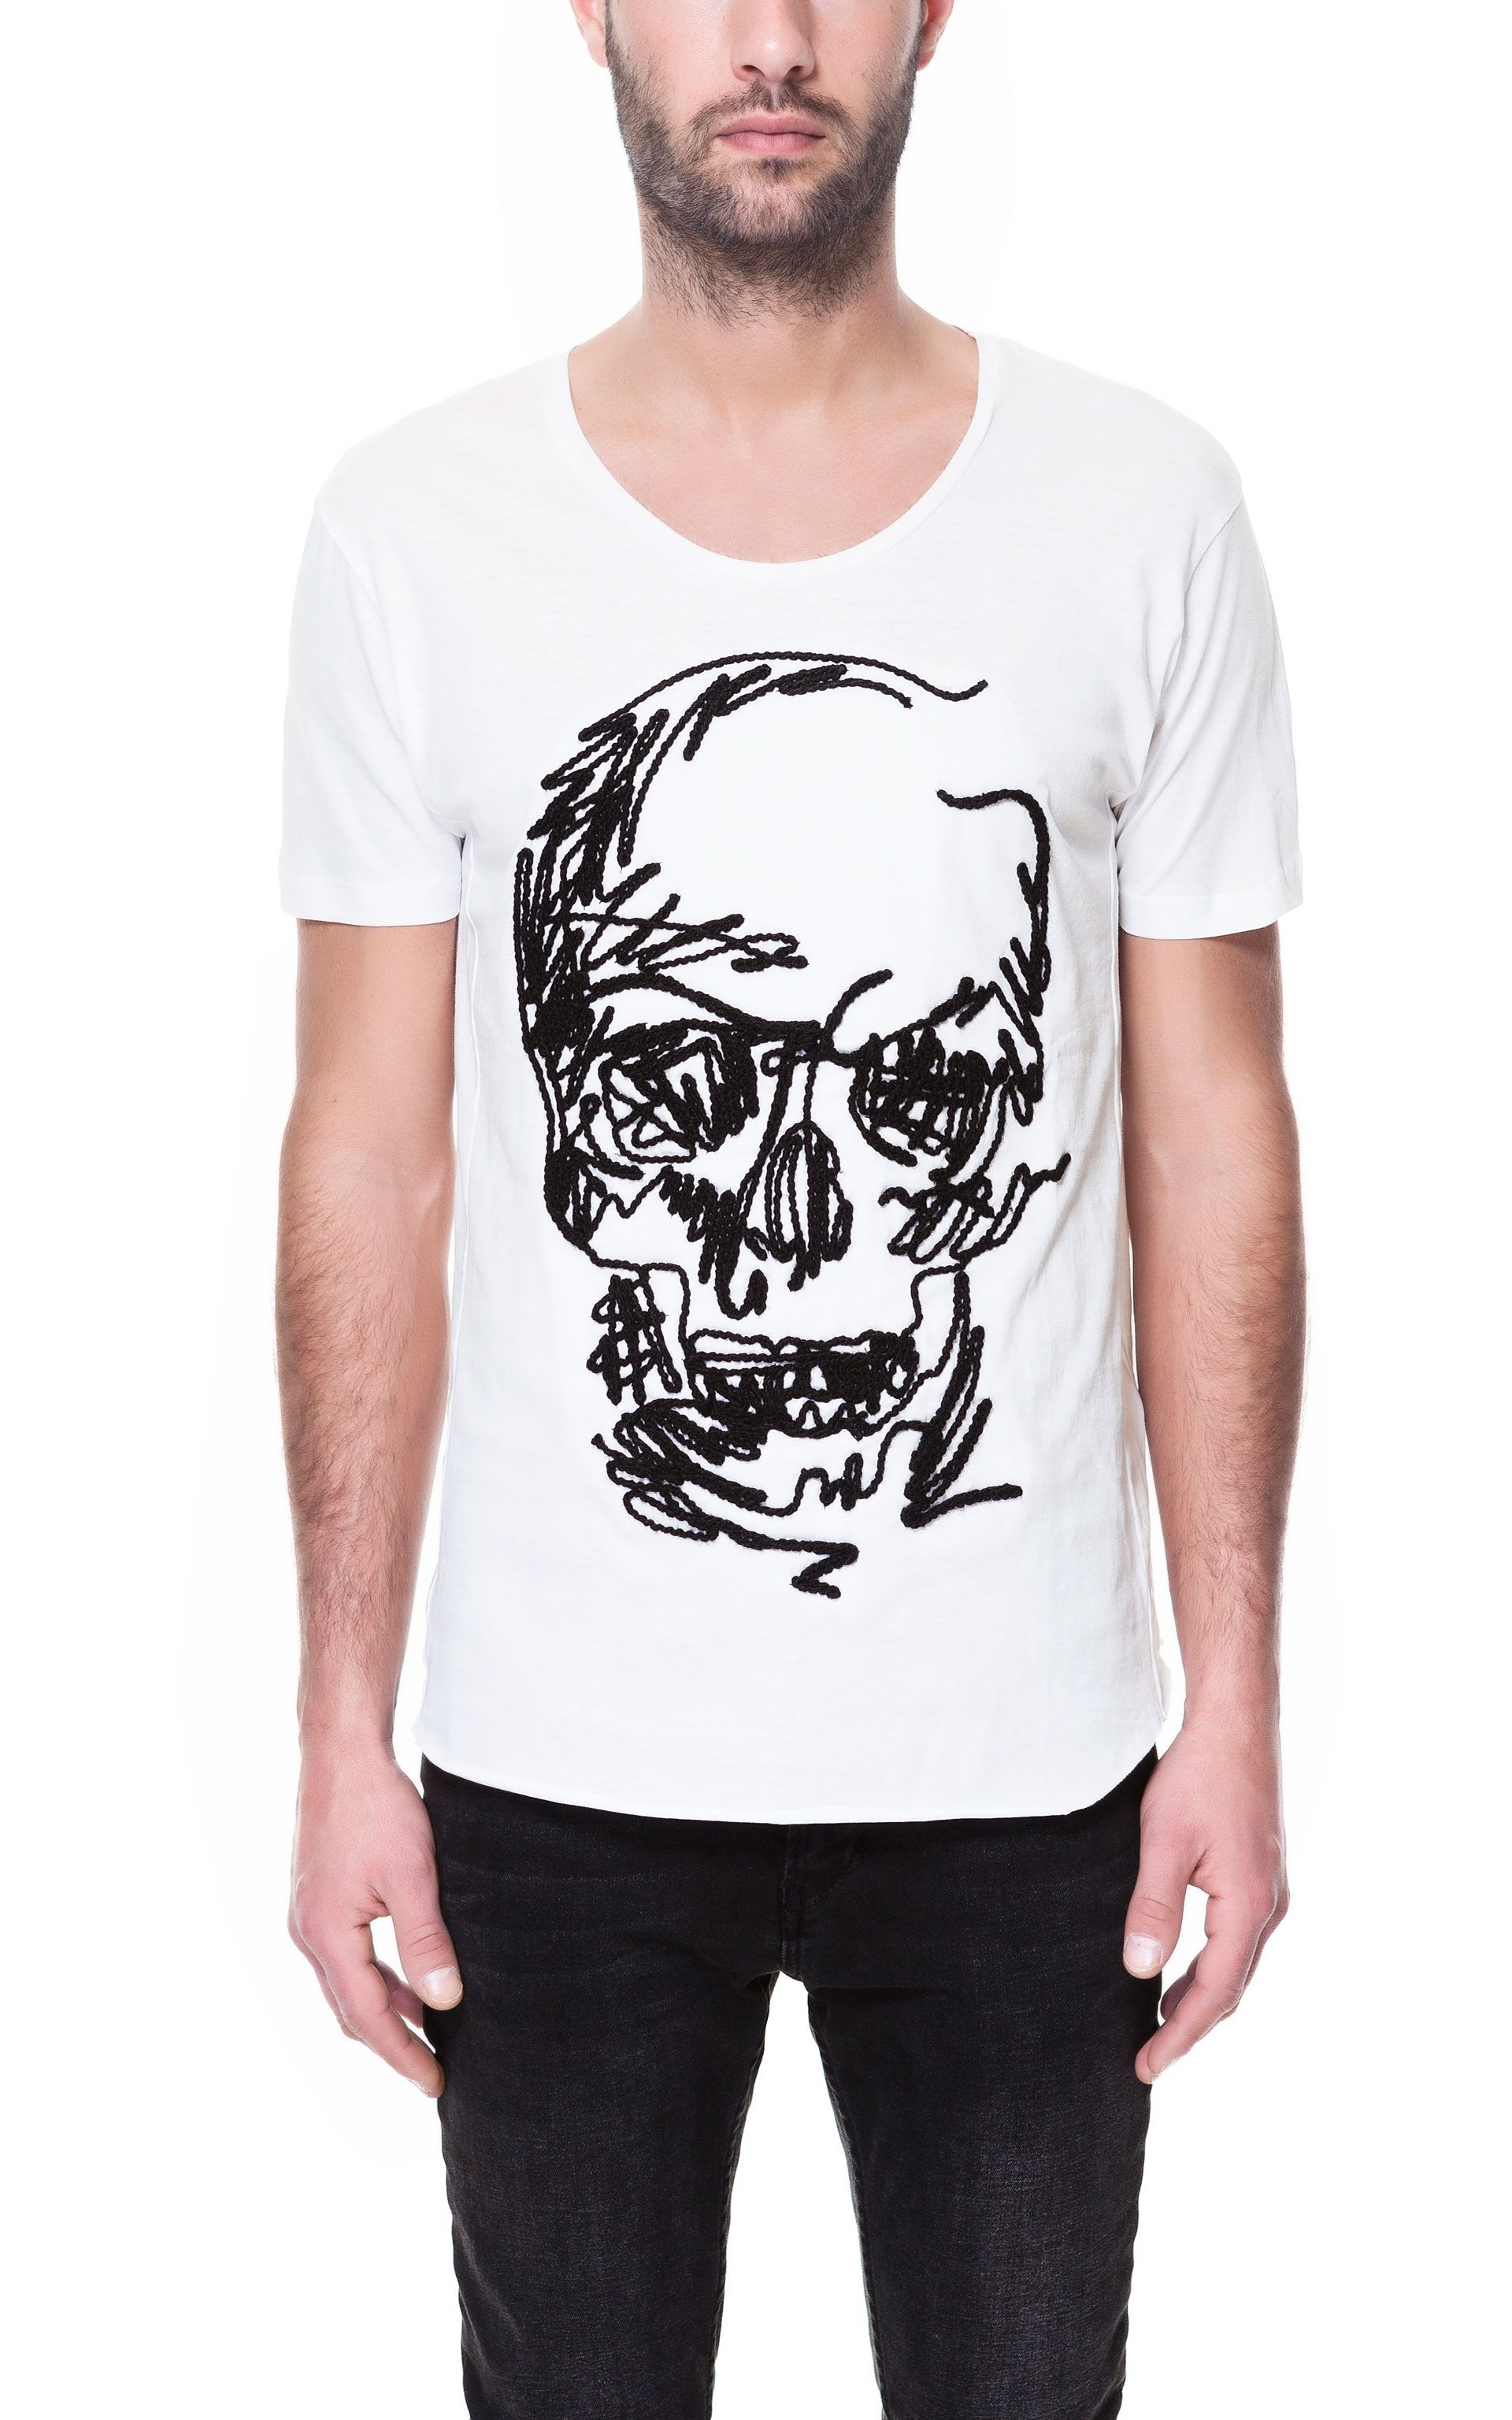 4e29ee30 SKULL T-SHIRT - T-shirts - Man - ZARA Singapore | My style in 2019 ...